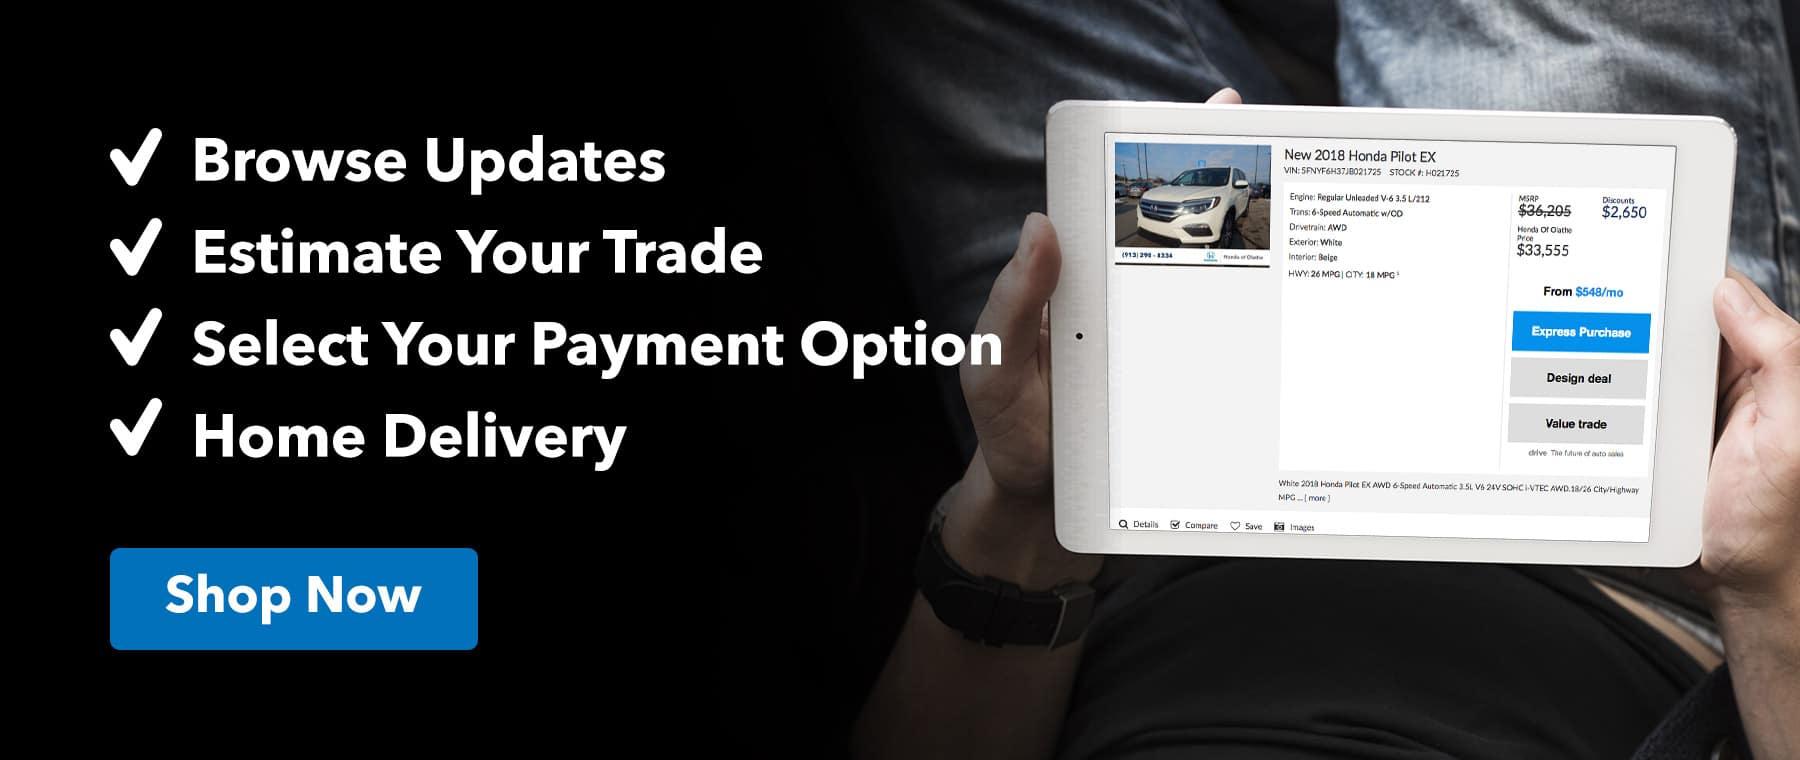 Shop Online with Honda of Olathe